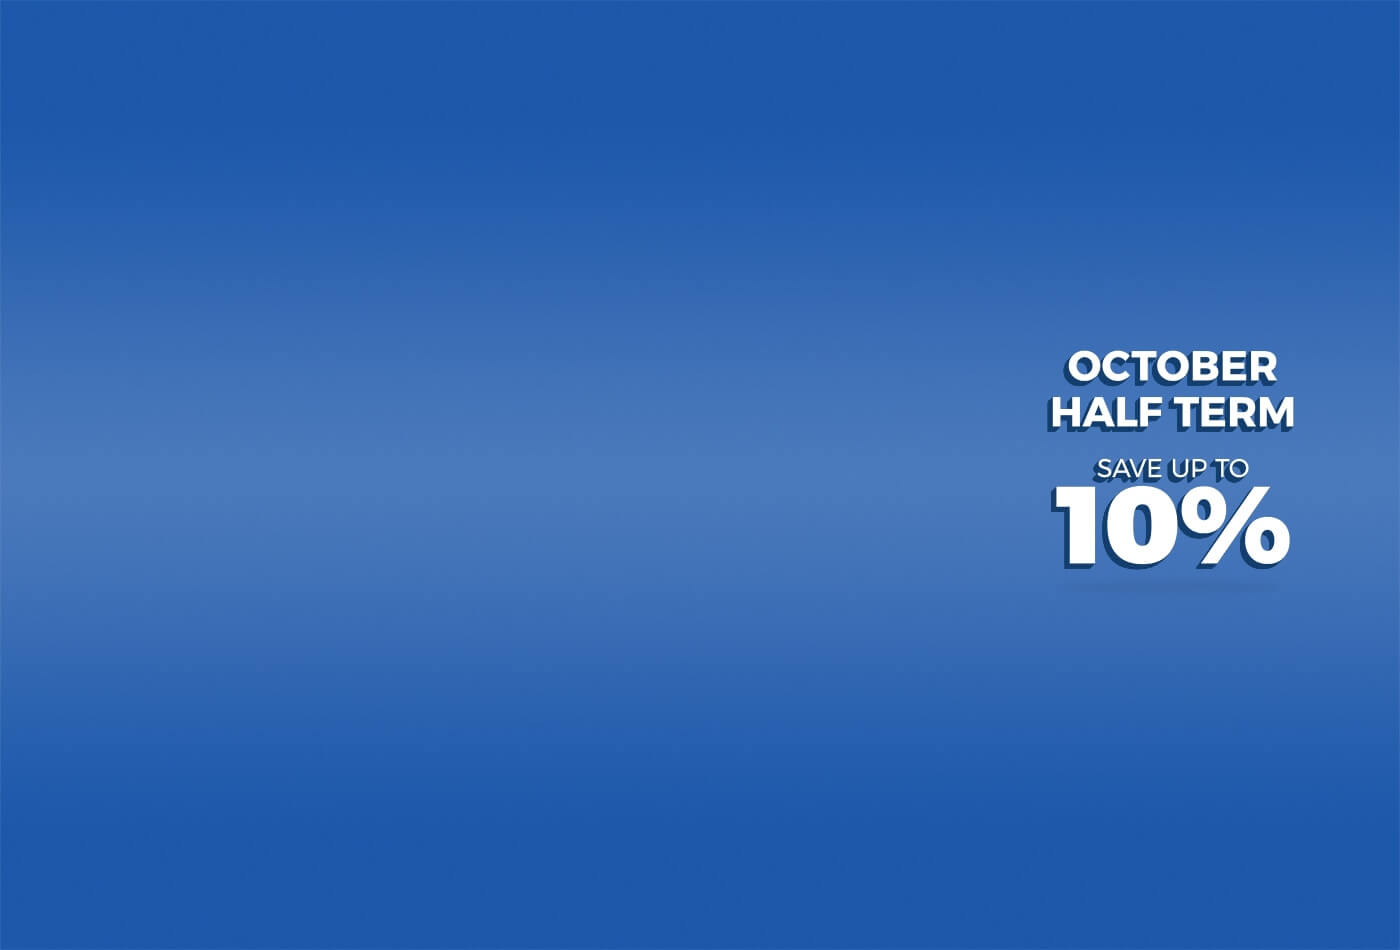 October half term feature image